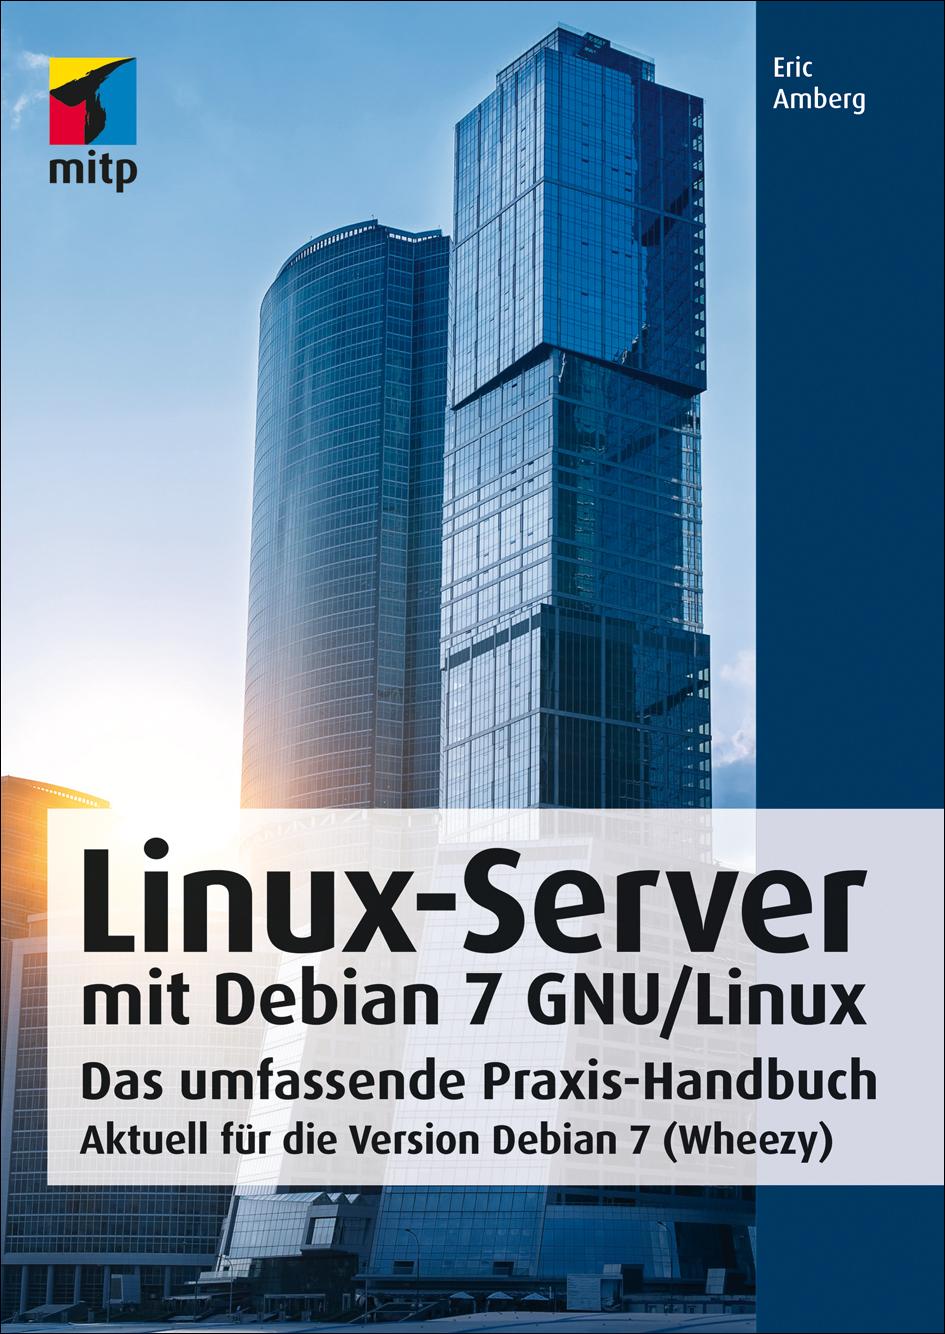 Linux Server mit Debian 7 GNU/Linux (mitp Profe...